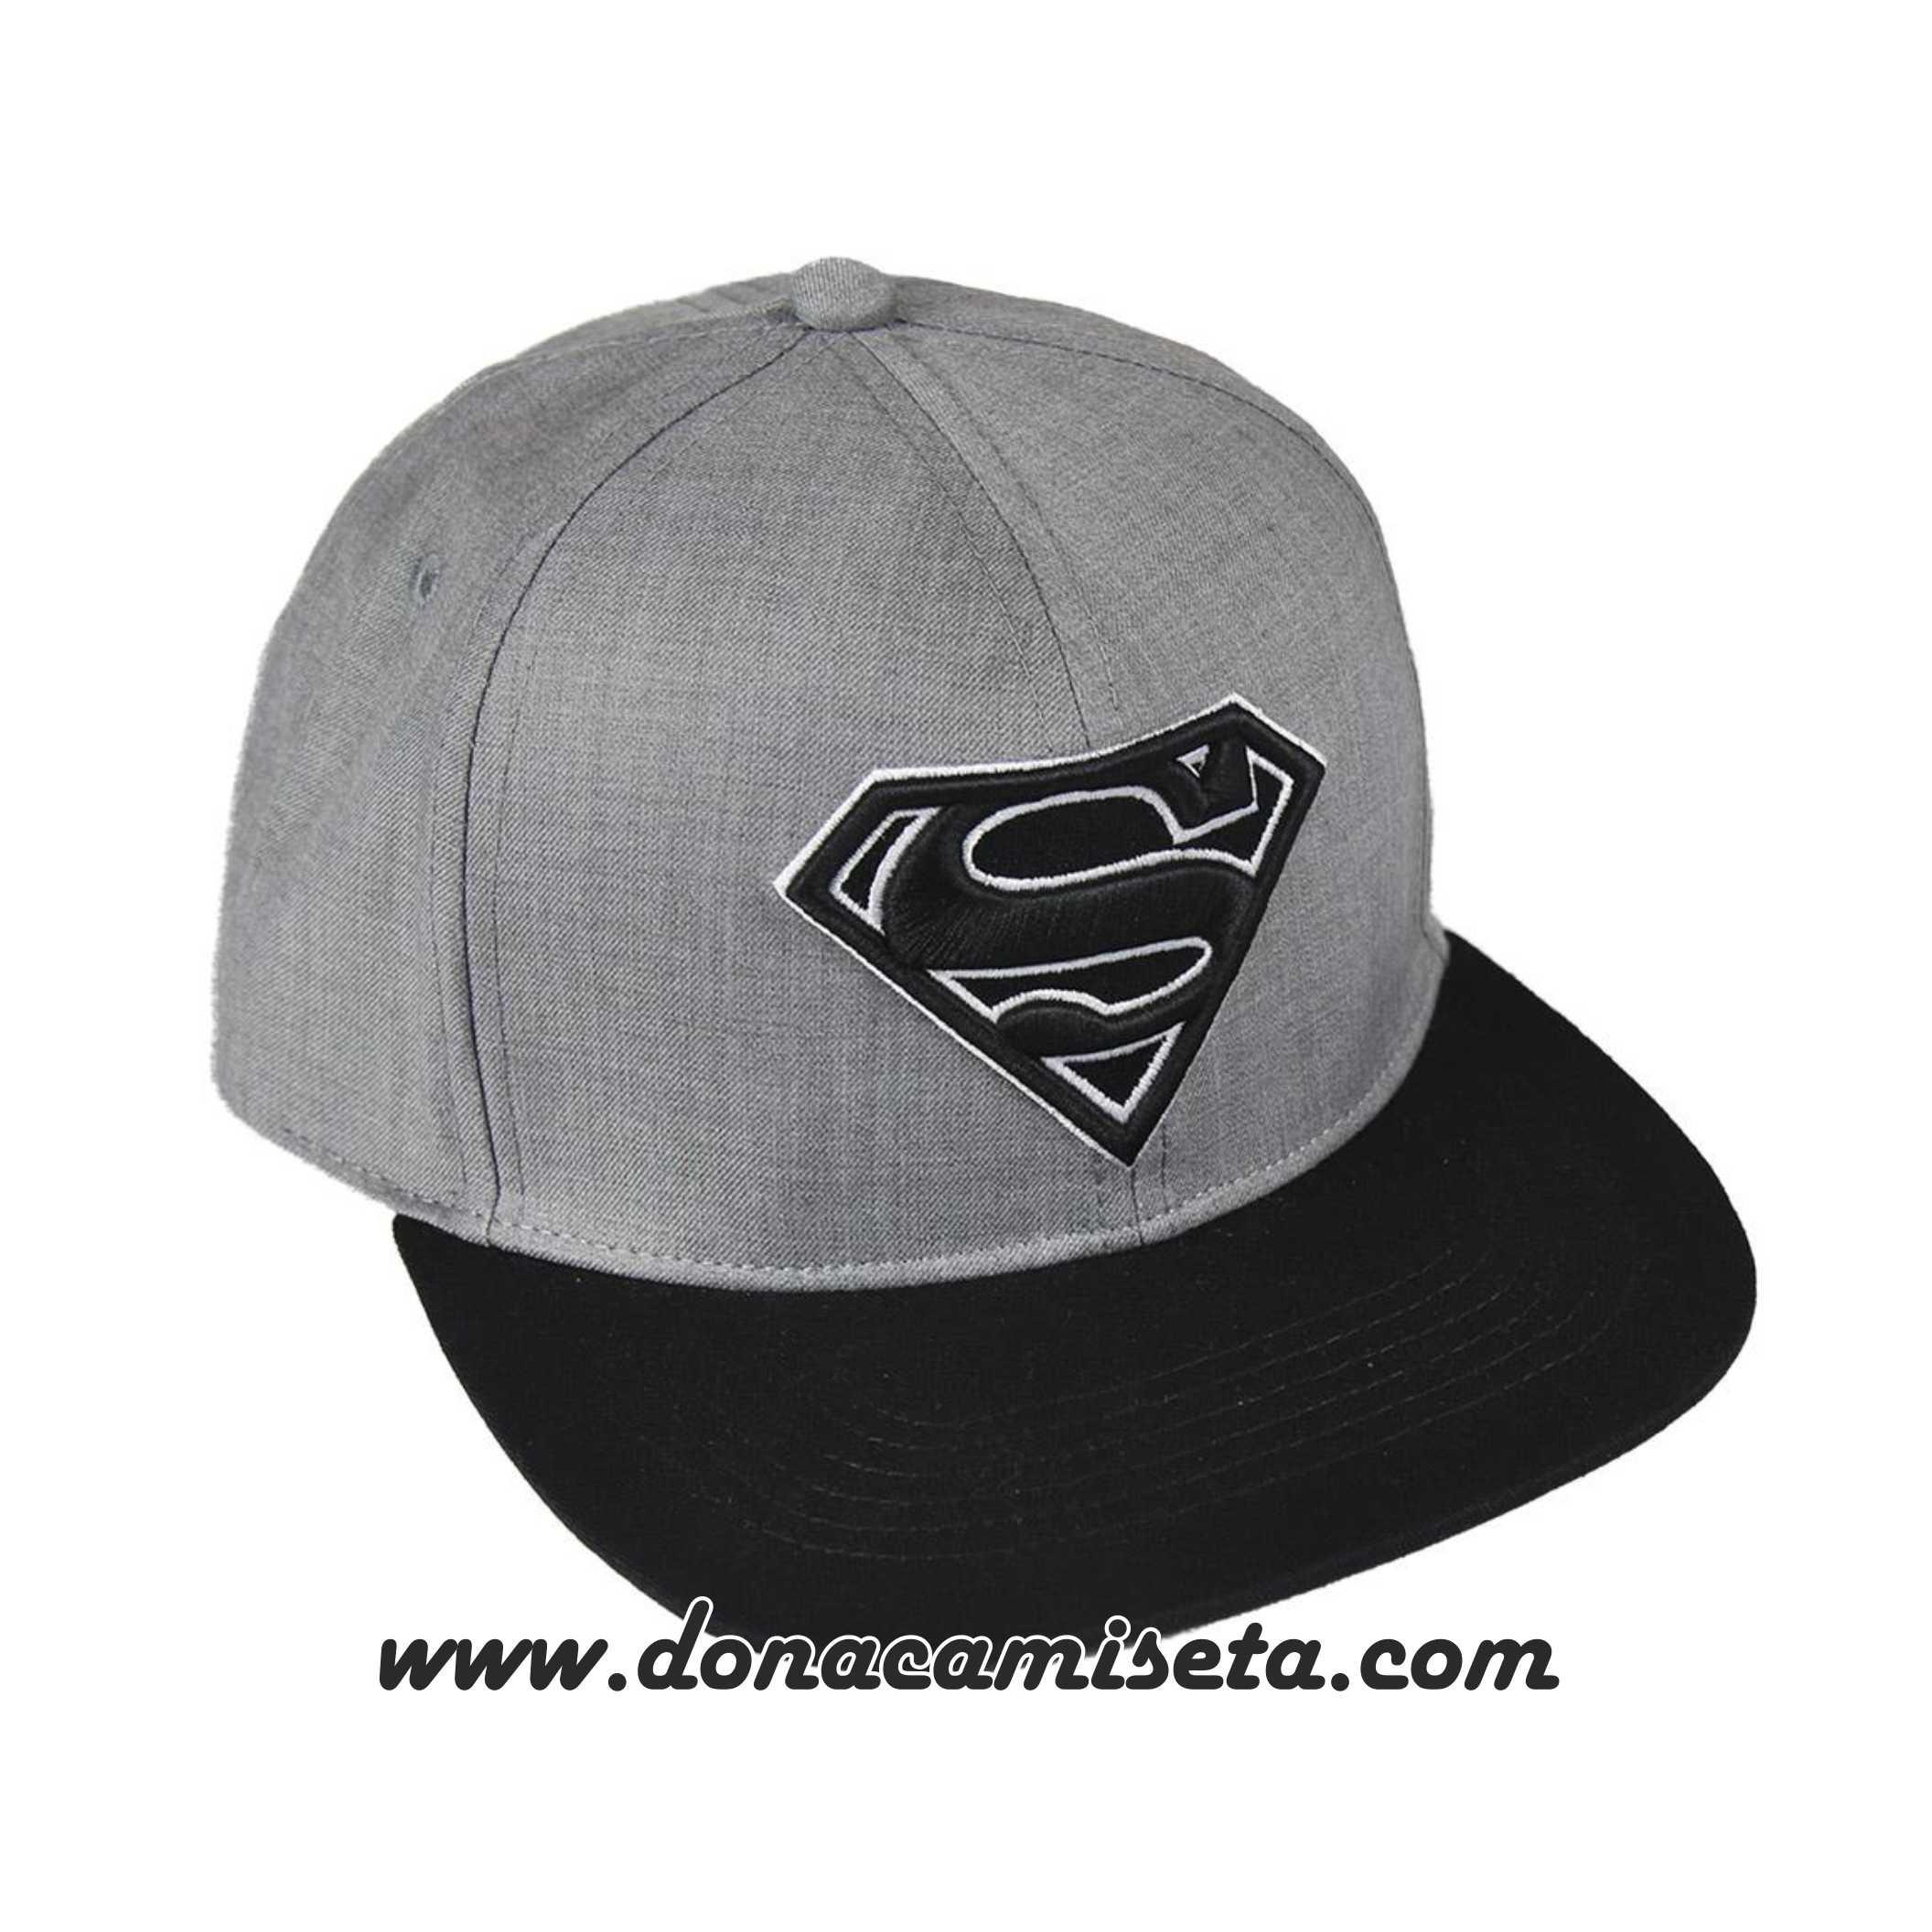 Gorra Superman logo 3D gris visera plana premium dfe1338ae98